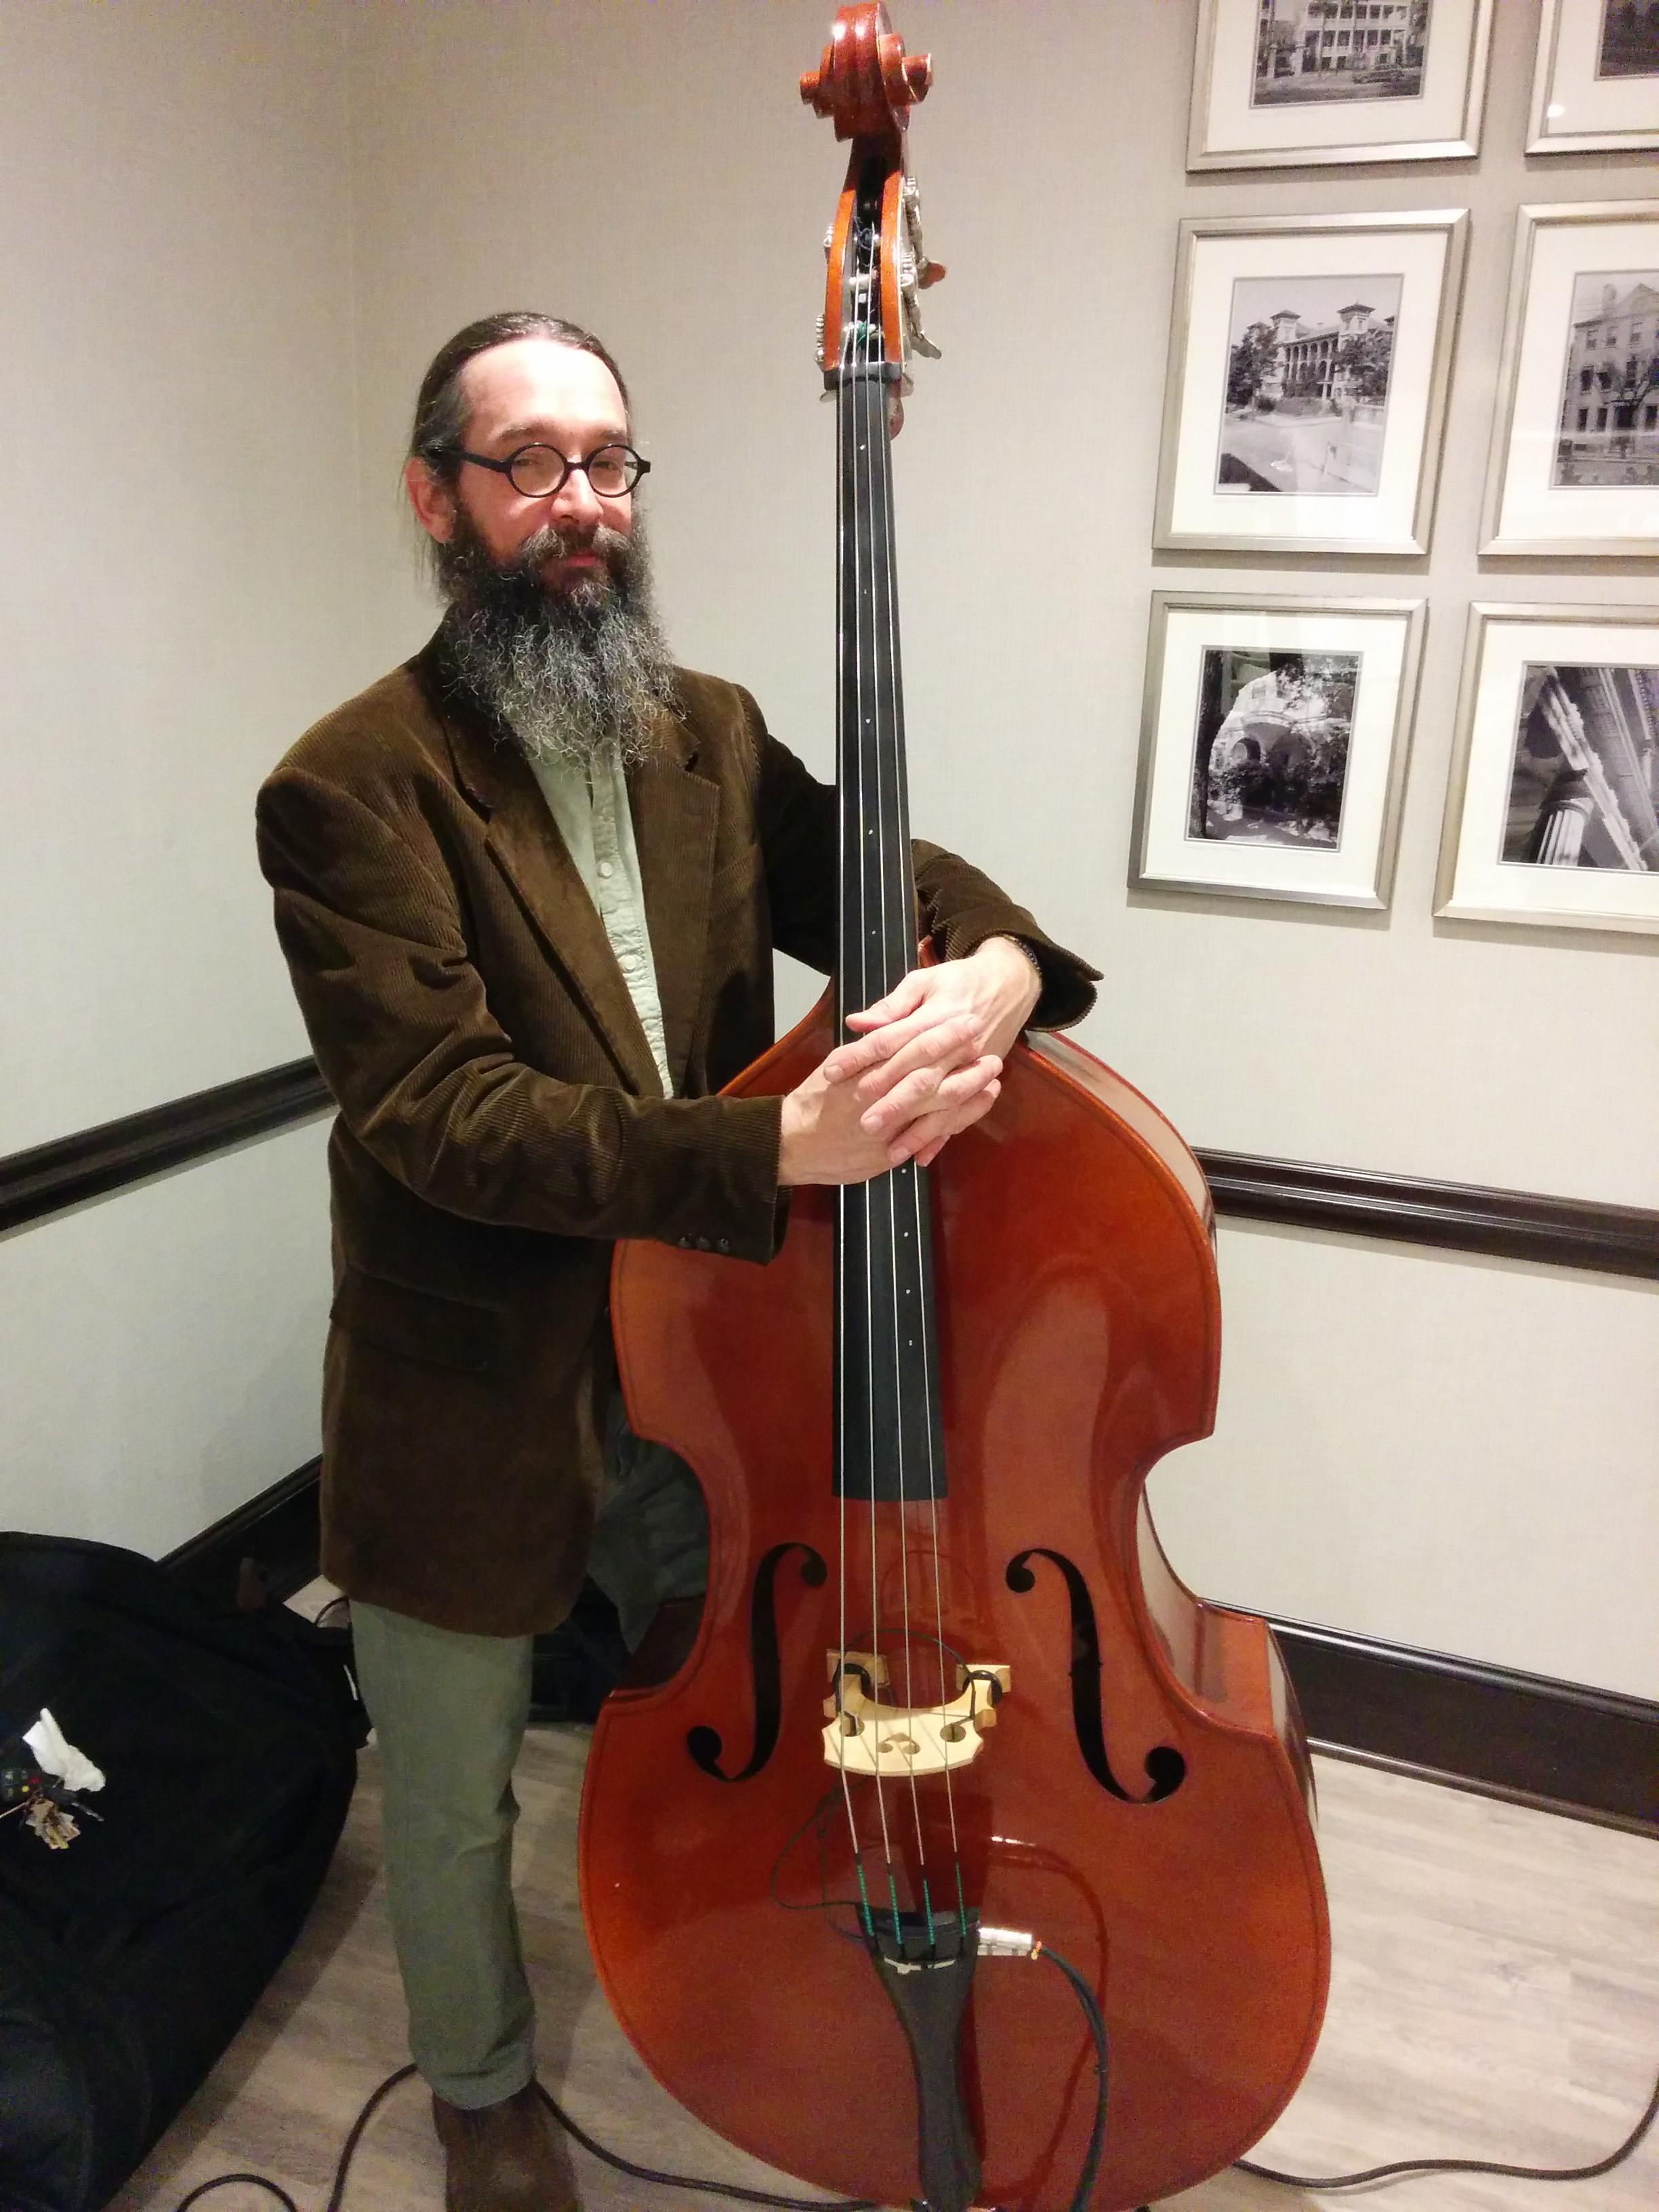 Meet the Palmetto Strings Musicians